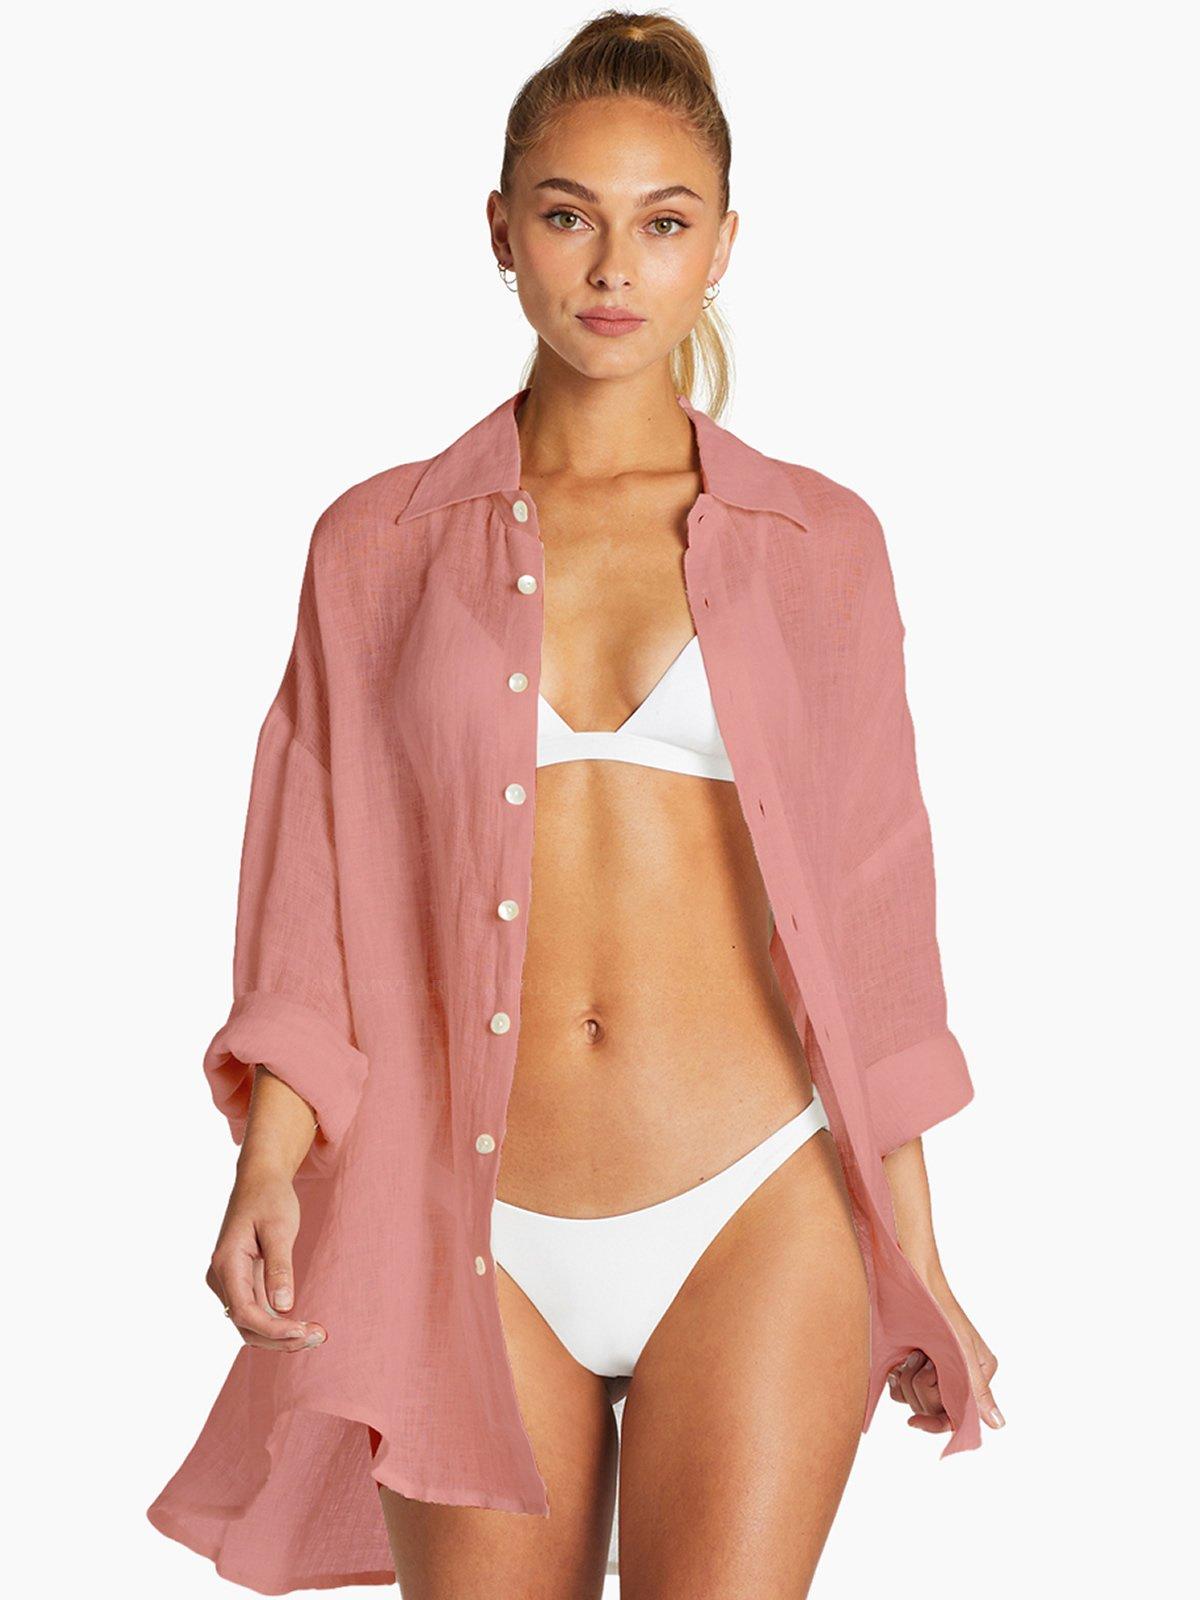 Playa Shirt Dress by Vitamin A, available on swimwearworld.com for $125 Hailey Baldwin Outerwear Exact Product